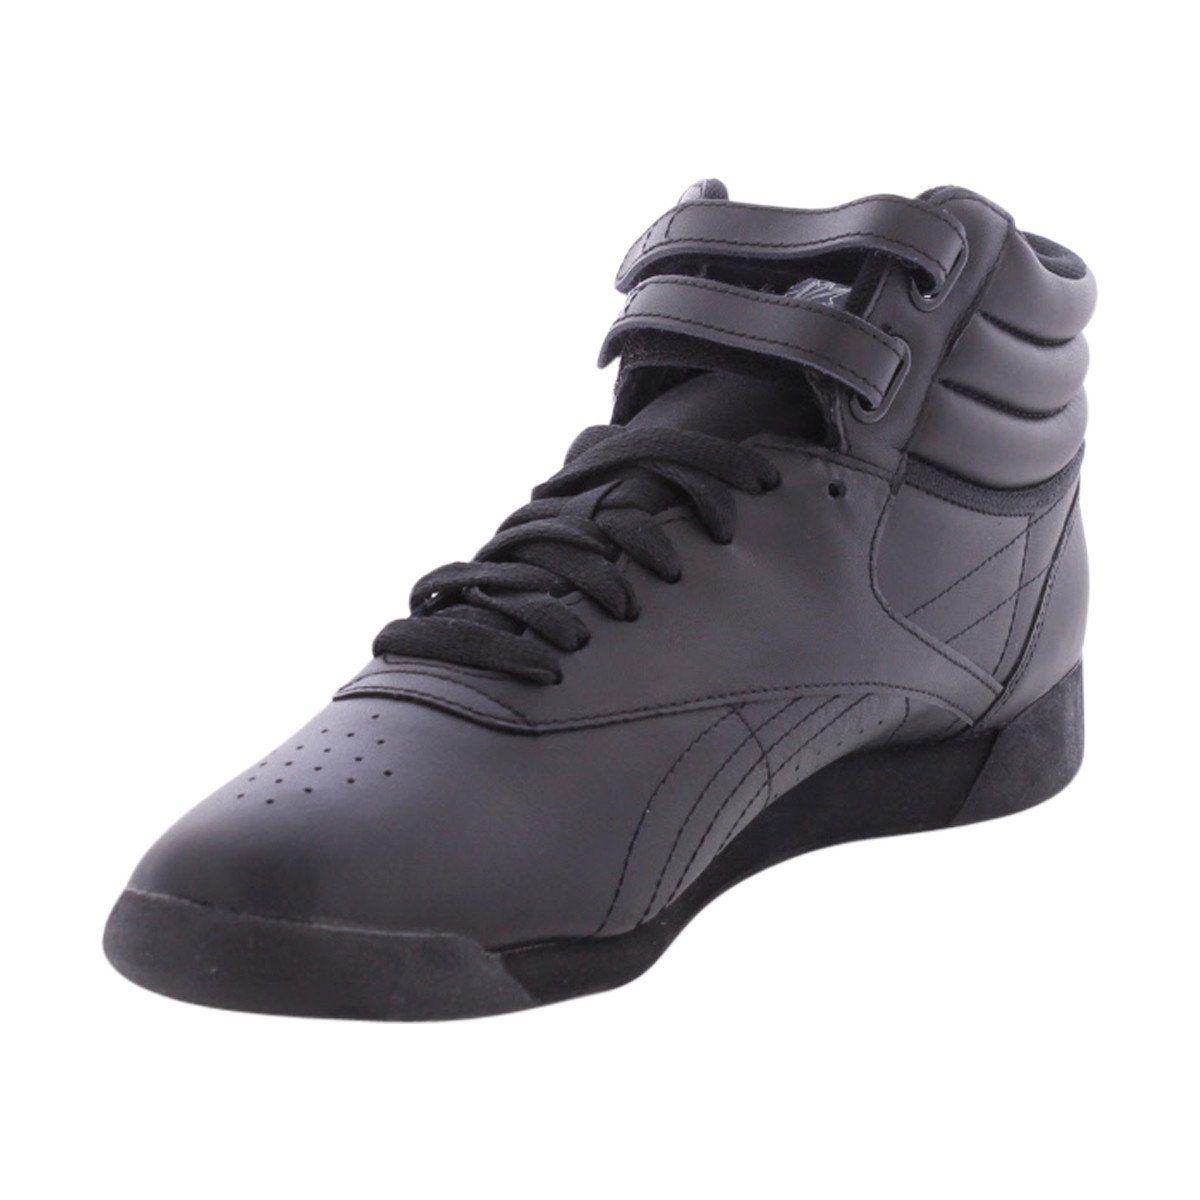 Pin by Nakia Pierson on shoes   Diadora sneakers, Sneakers